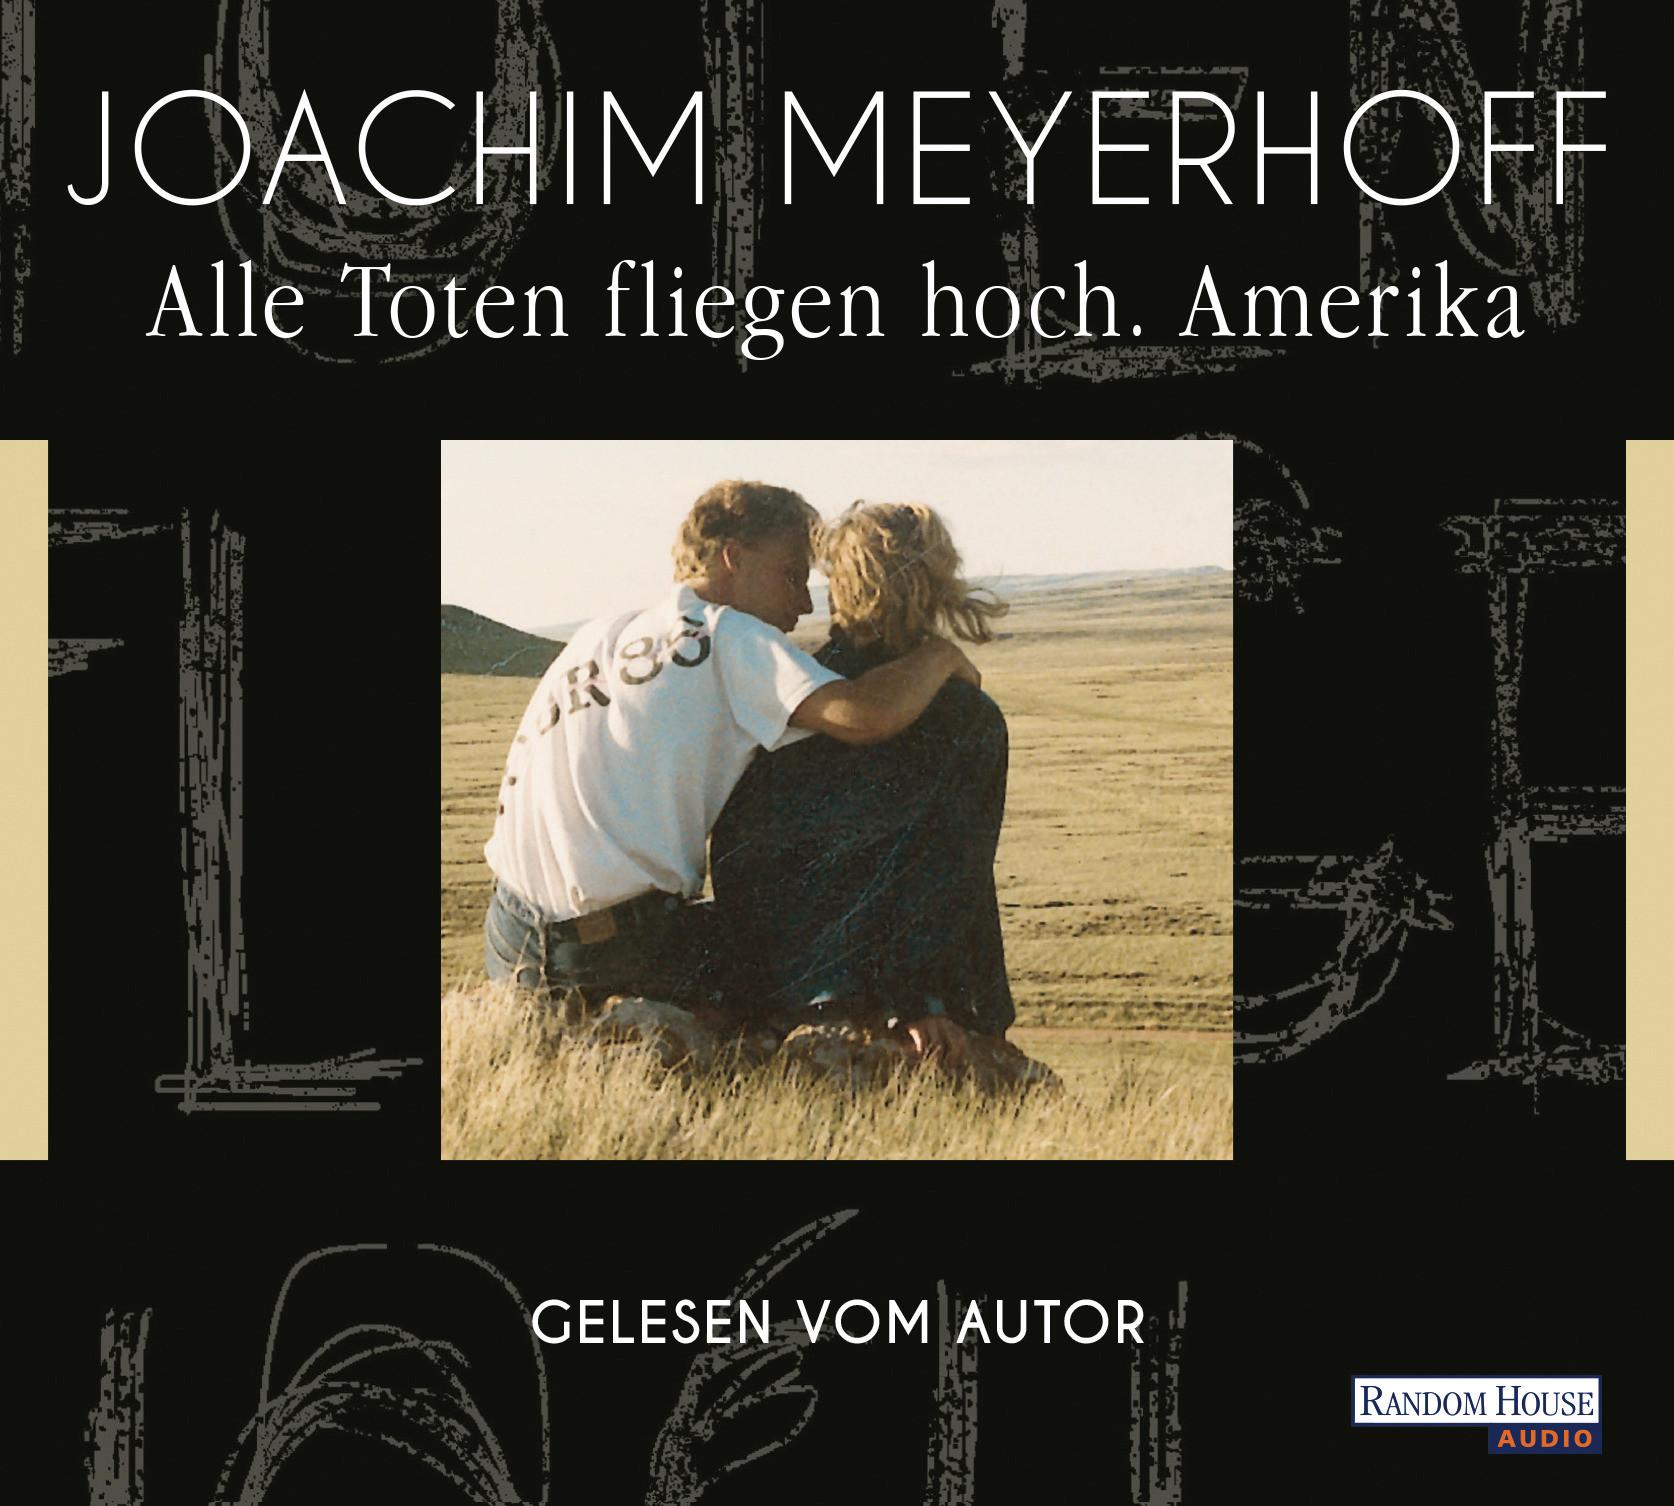 Joachim Meyerhoff - Alle Toten fliegen hoch. Amerika